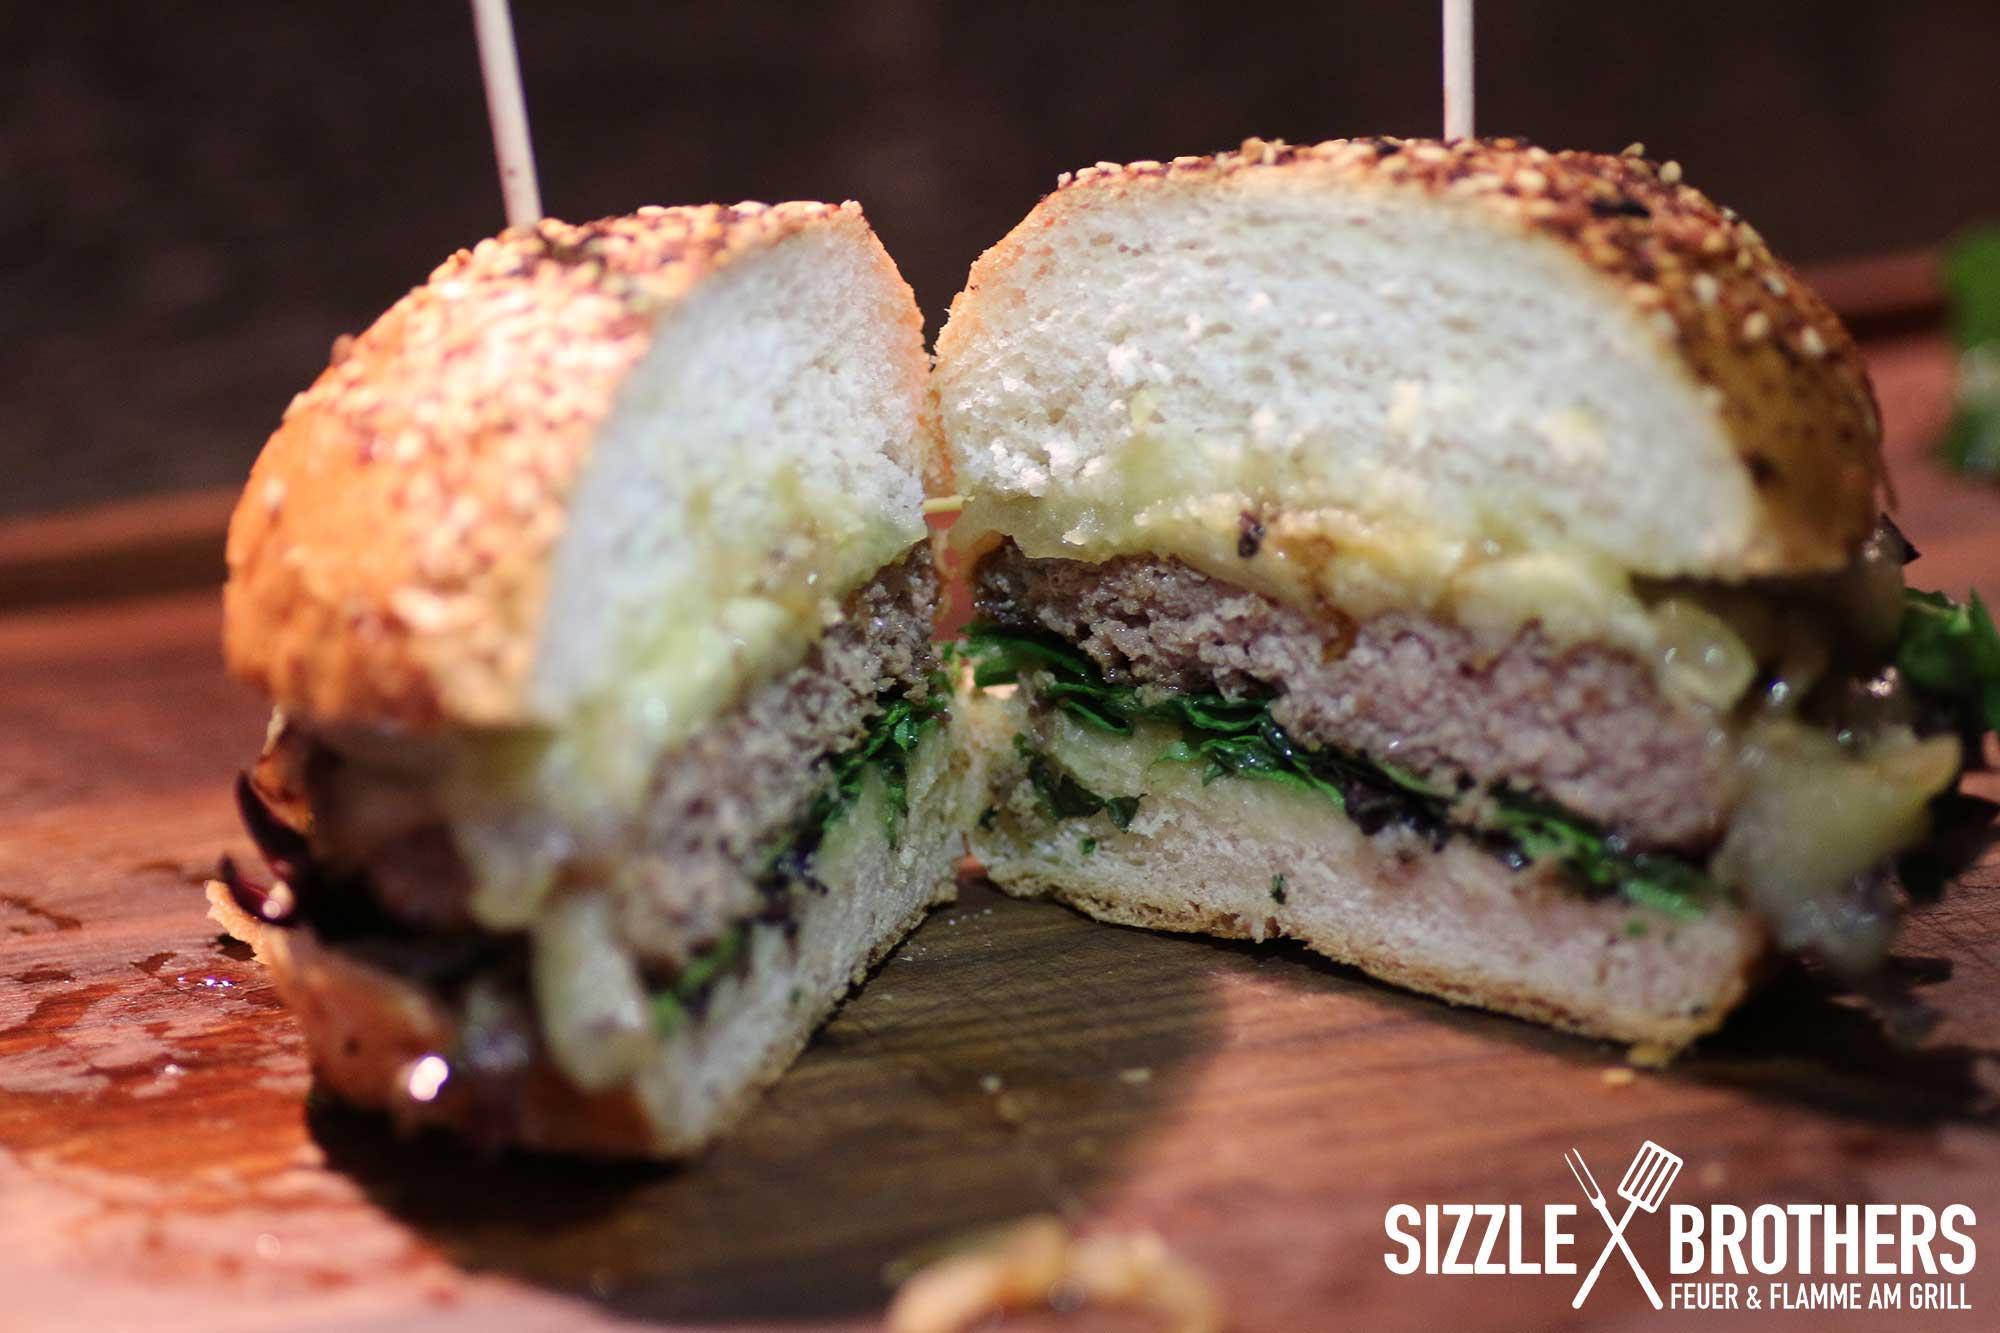 mangalitza-burger-anschnitt